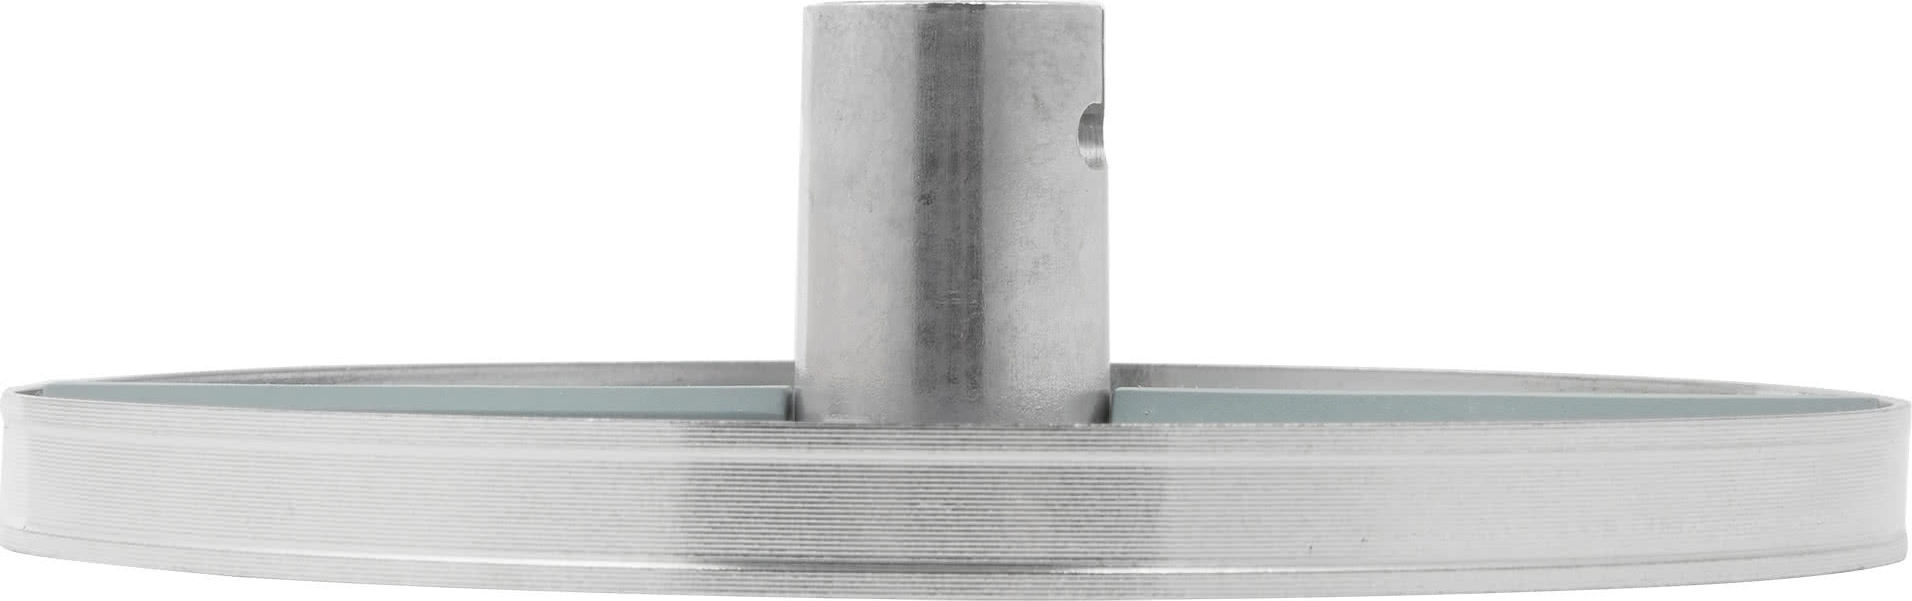 Диск-соломка Robot Coupe 27072 (2x4 мм) - 3